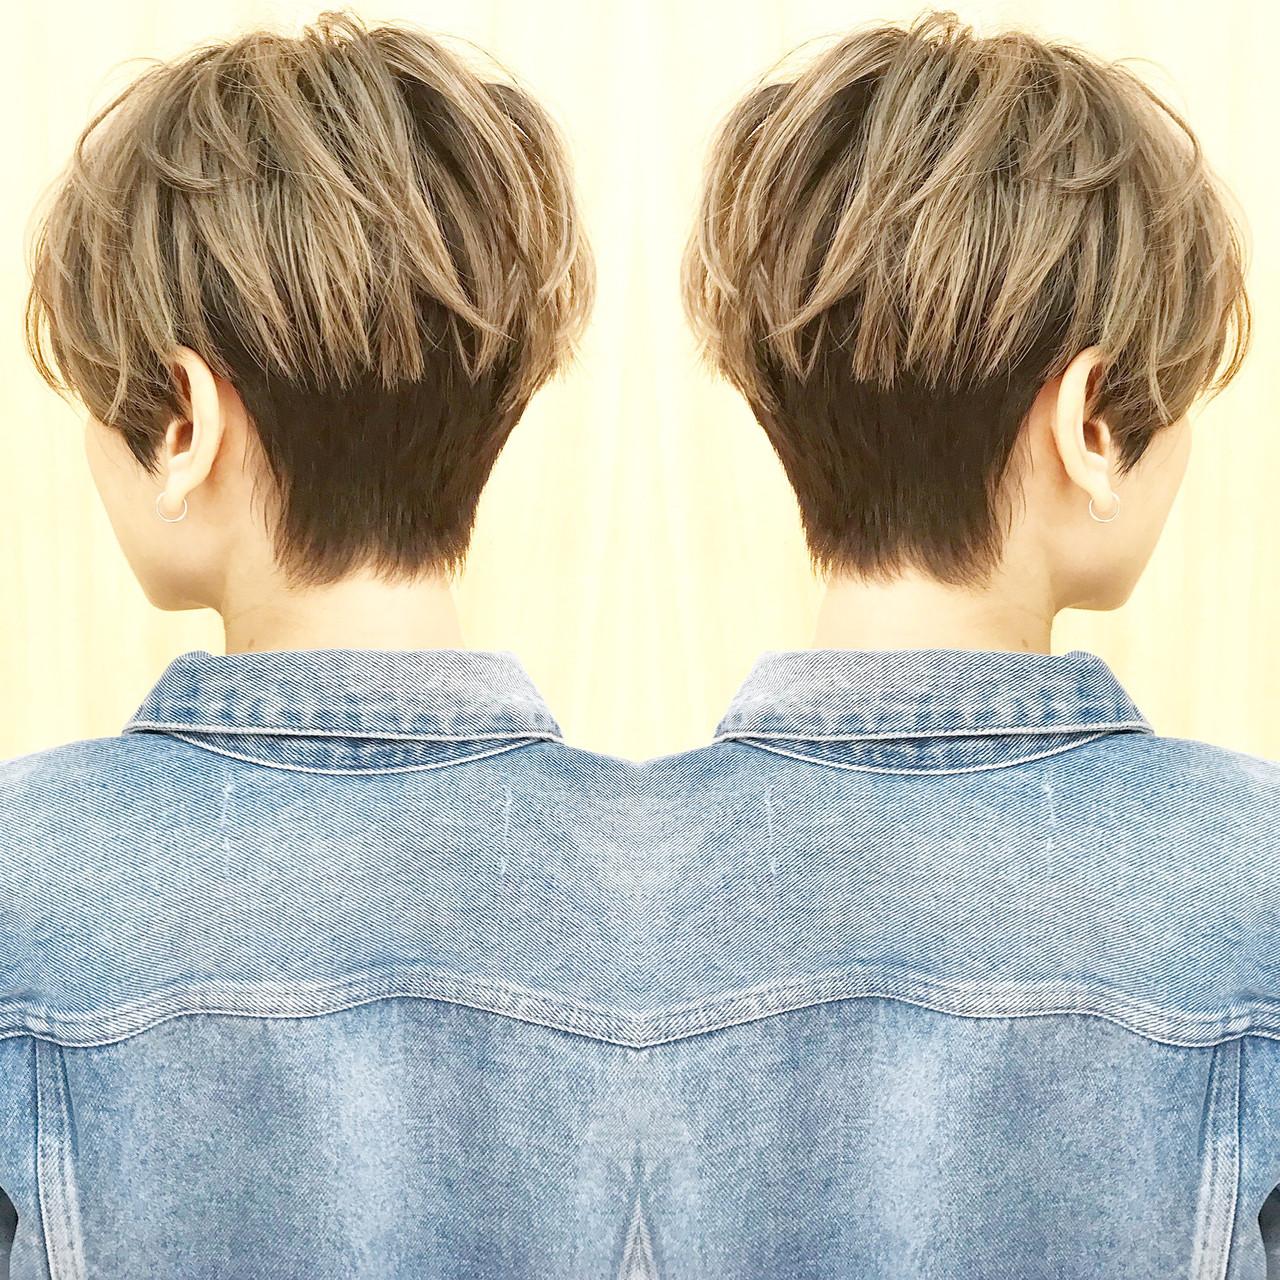 3Dハイライト デート ハイライト モード ヘアスタイルや髪型の写真・画像   ショートヘア美容師 #ナカイヒロキ / 『send by HAIR』